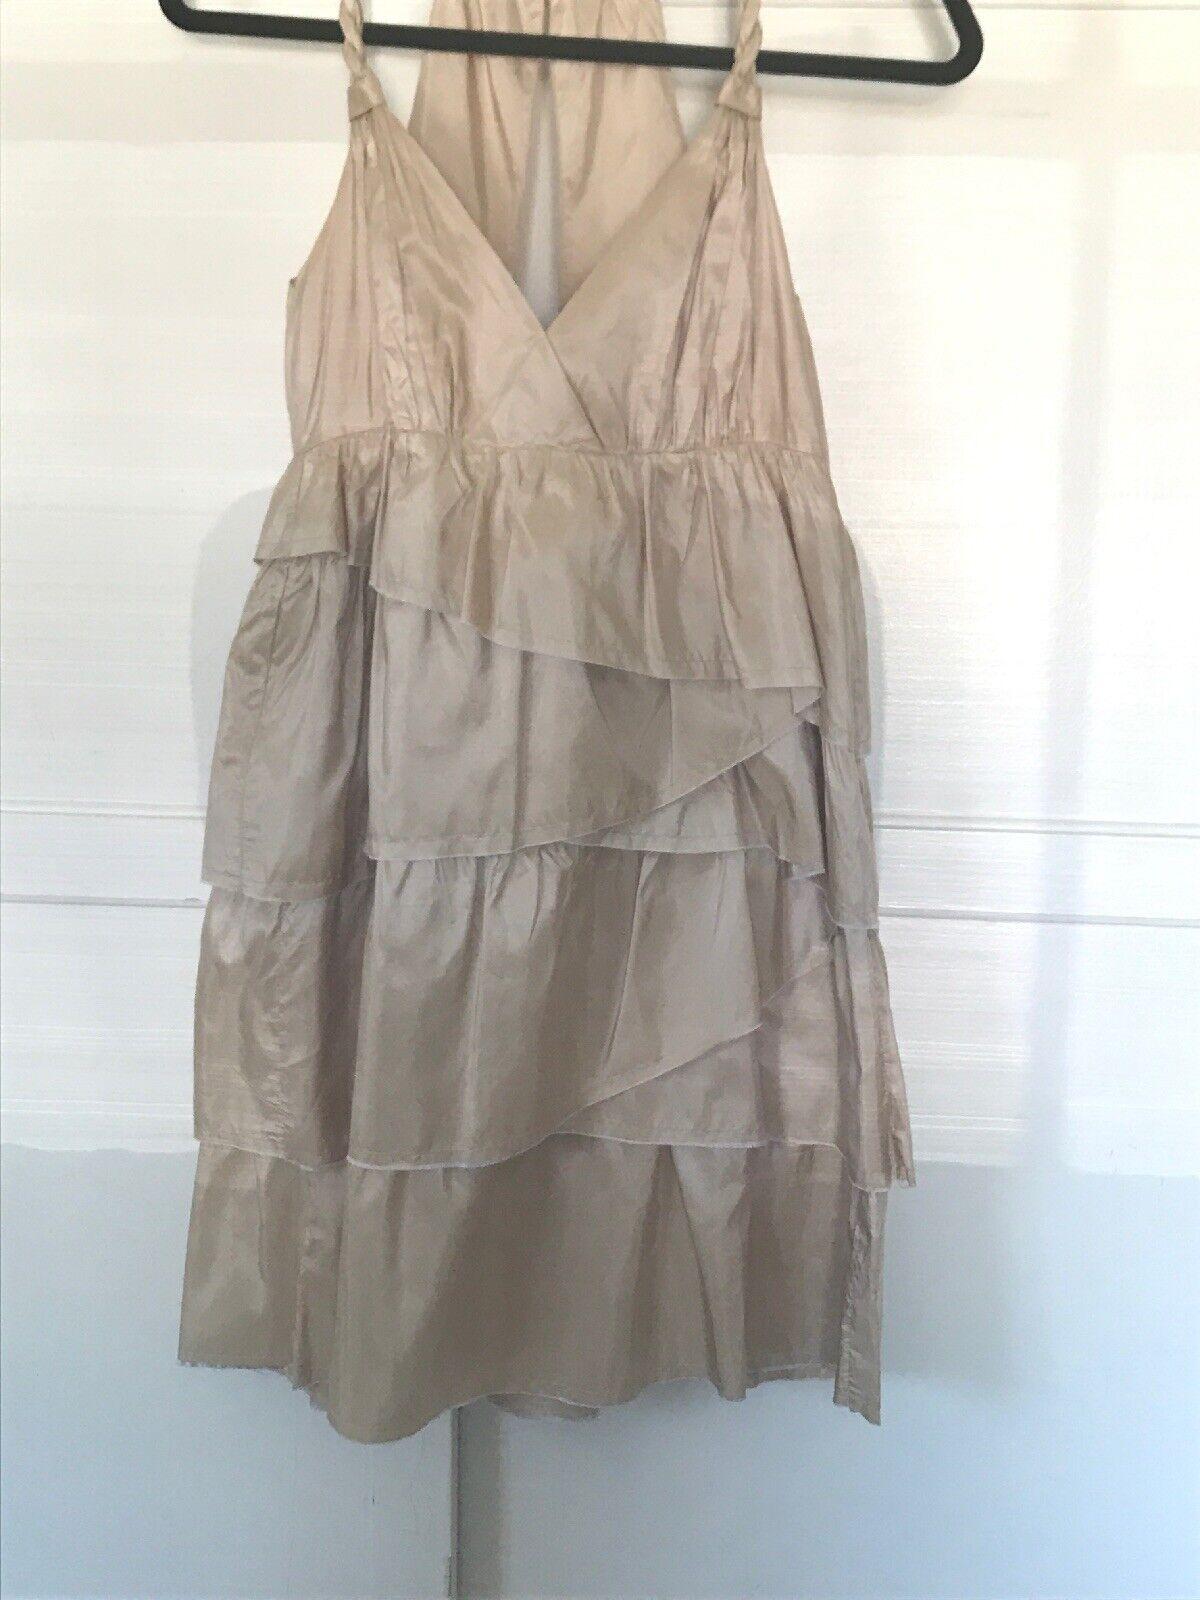 Calypso St Barth Celle Juno Silk Dress Beige Nude Braided Tierot Medium